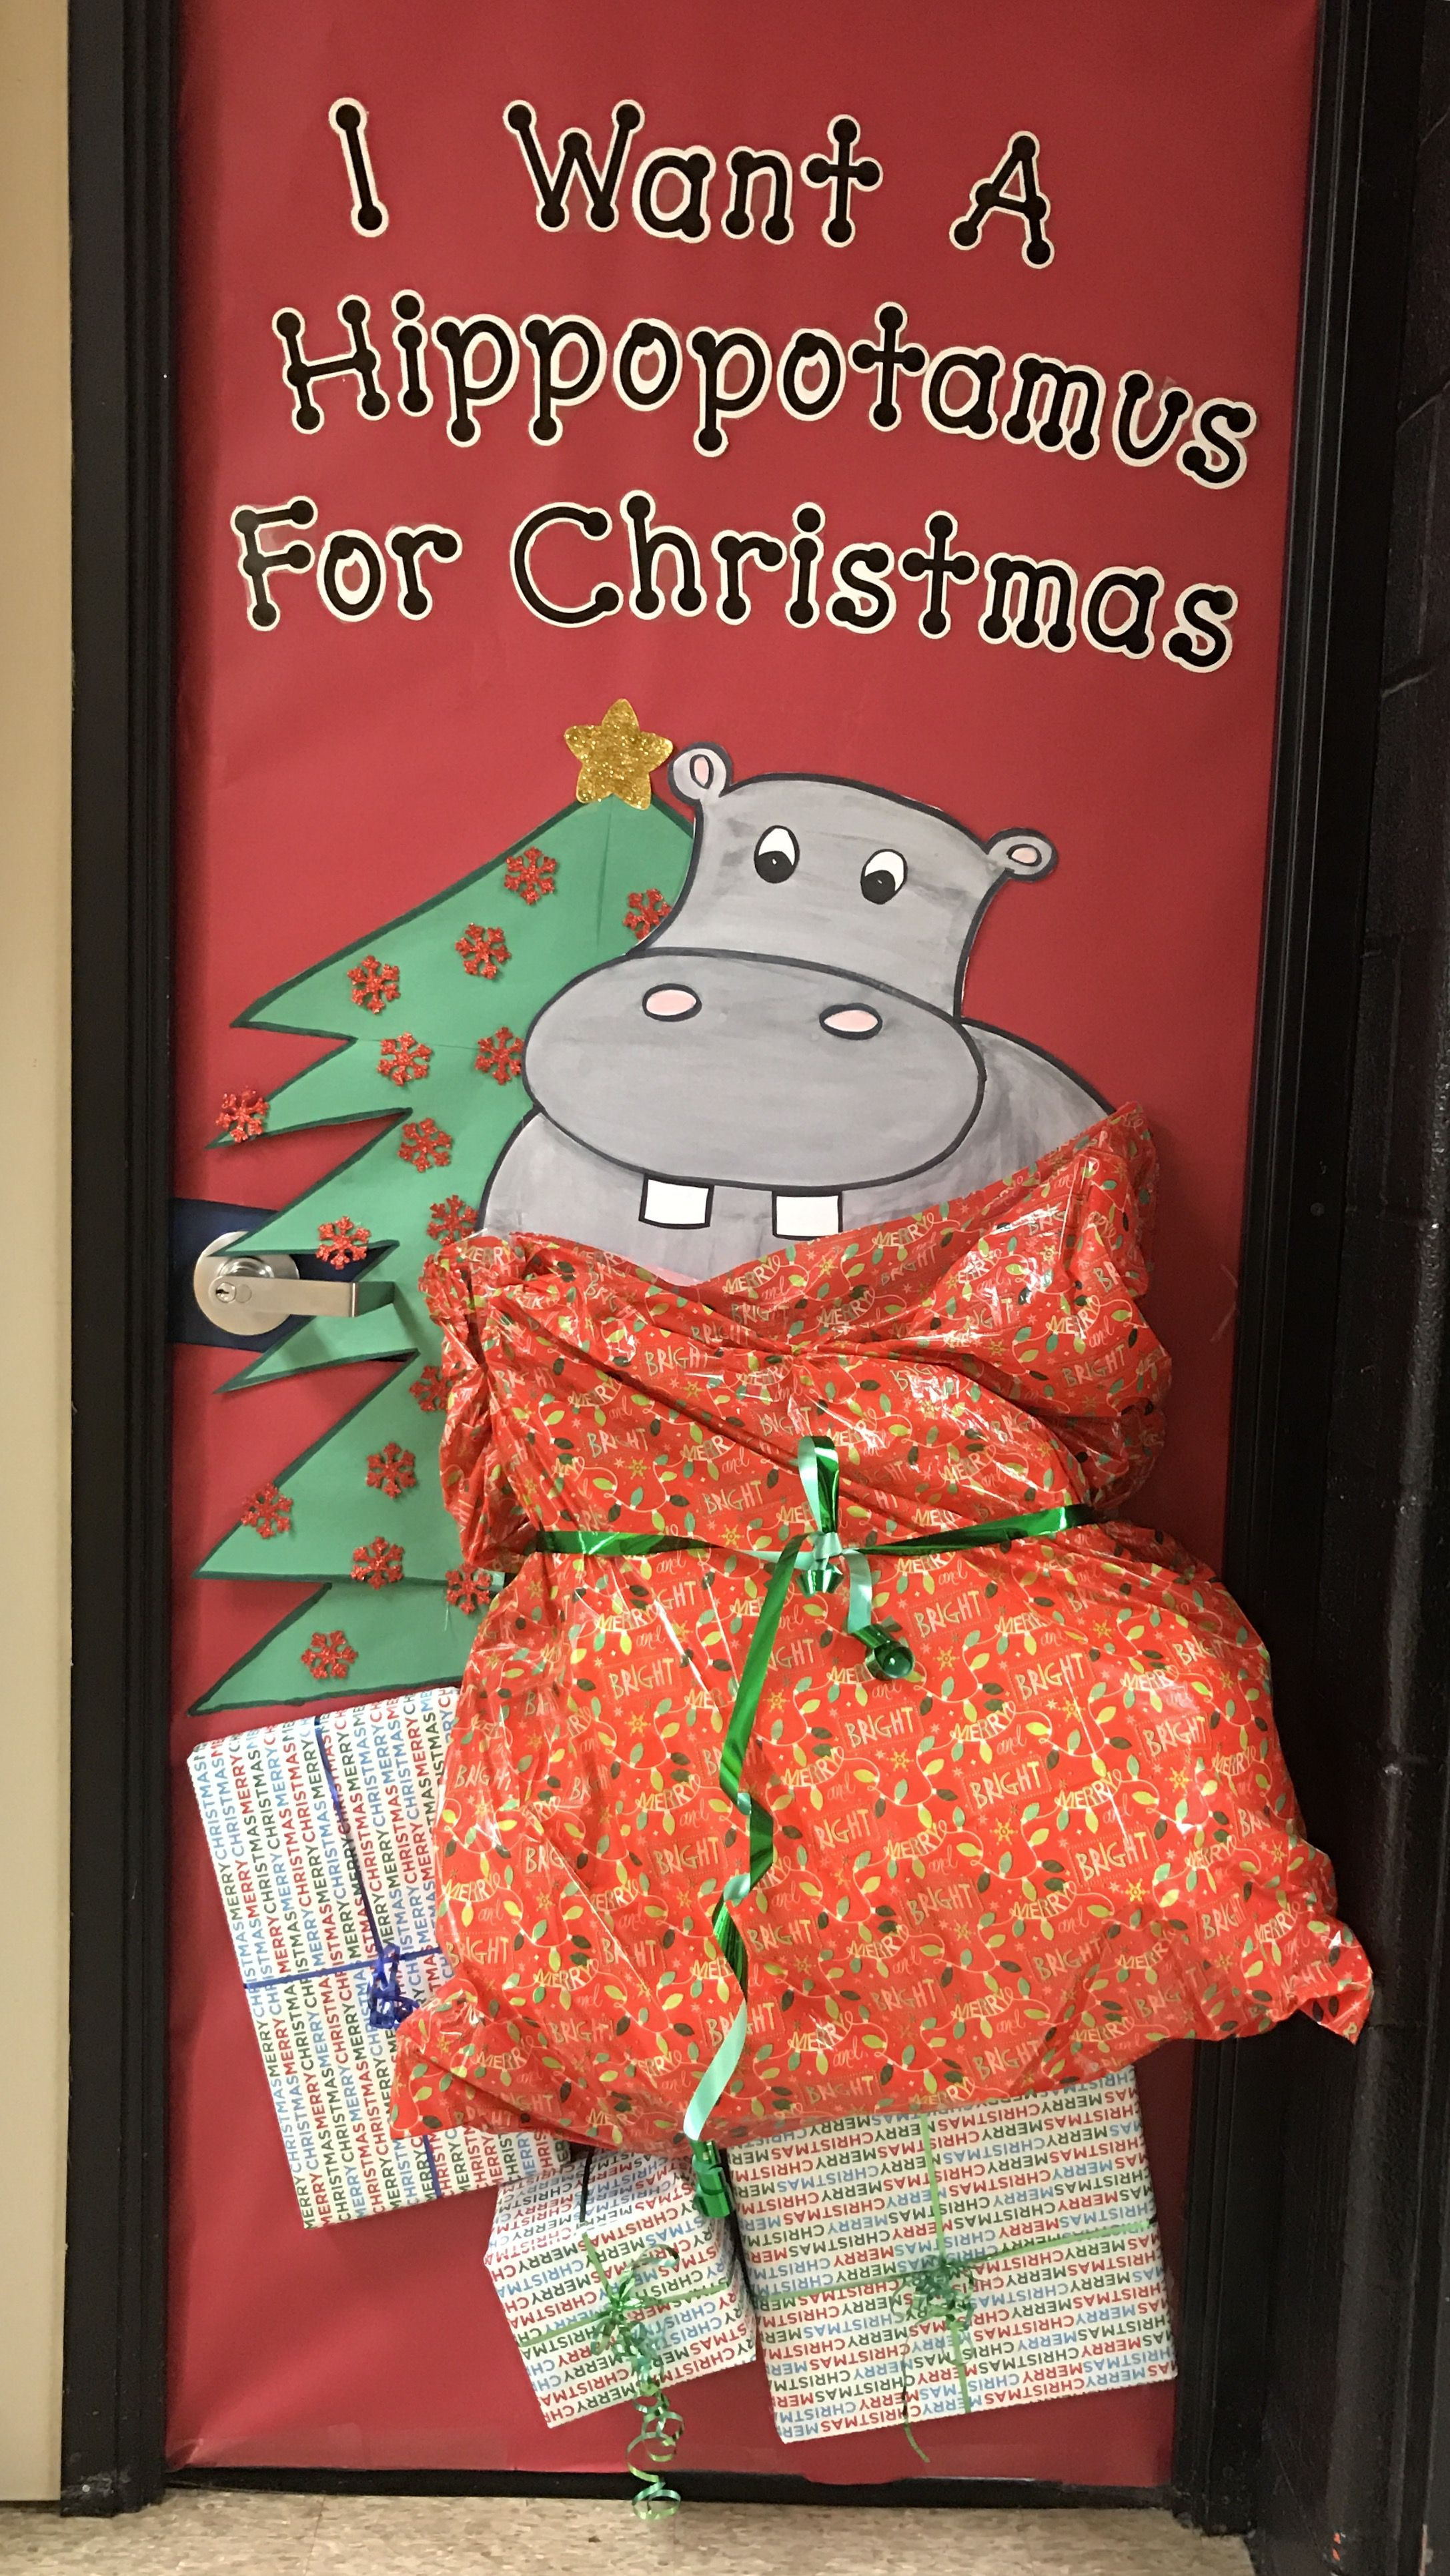 We Drew Song Titles For The Christmas Door Decorating Contest I Got My Favorite I D Christmas Door Decorating Contest Door Decorating Contest Christmas Door